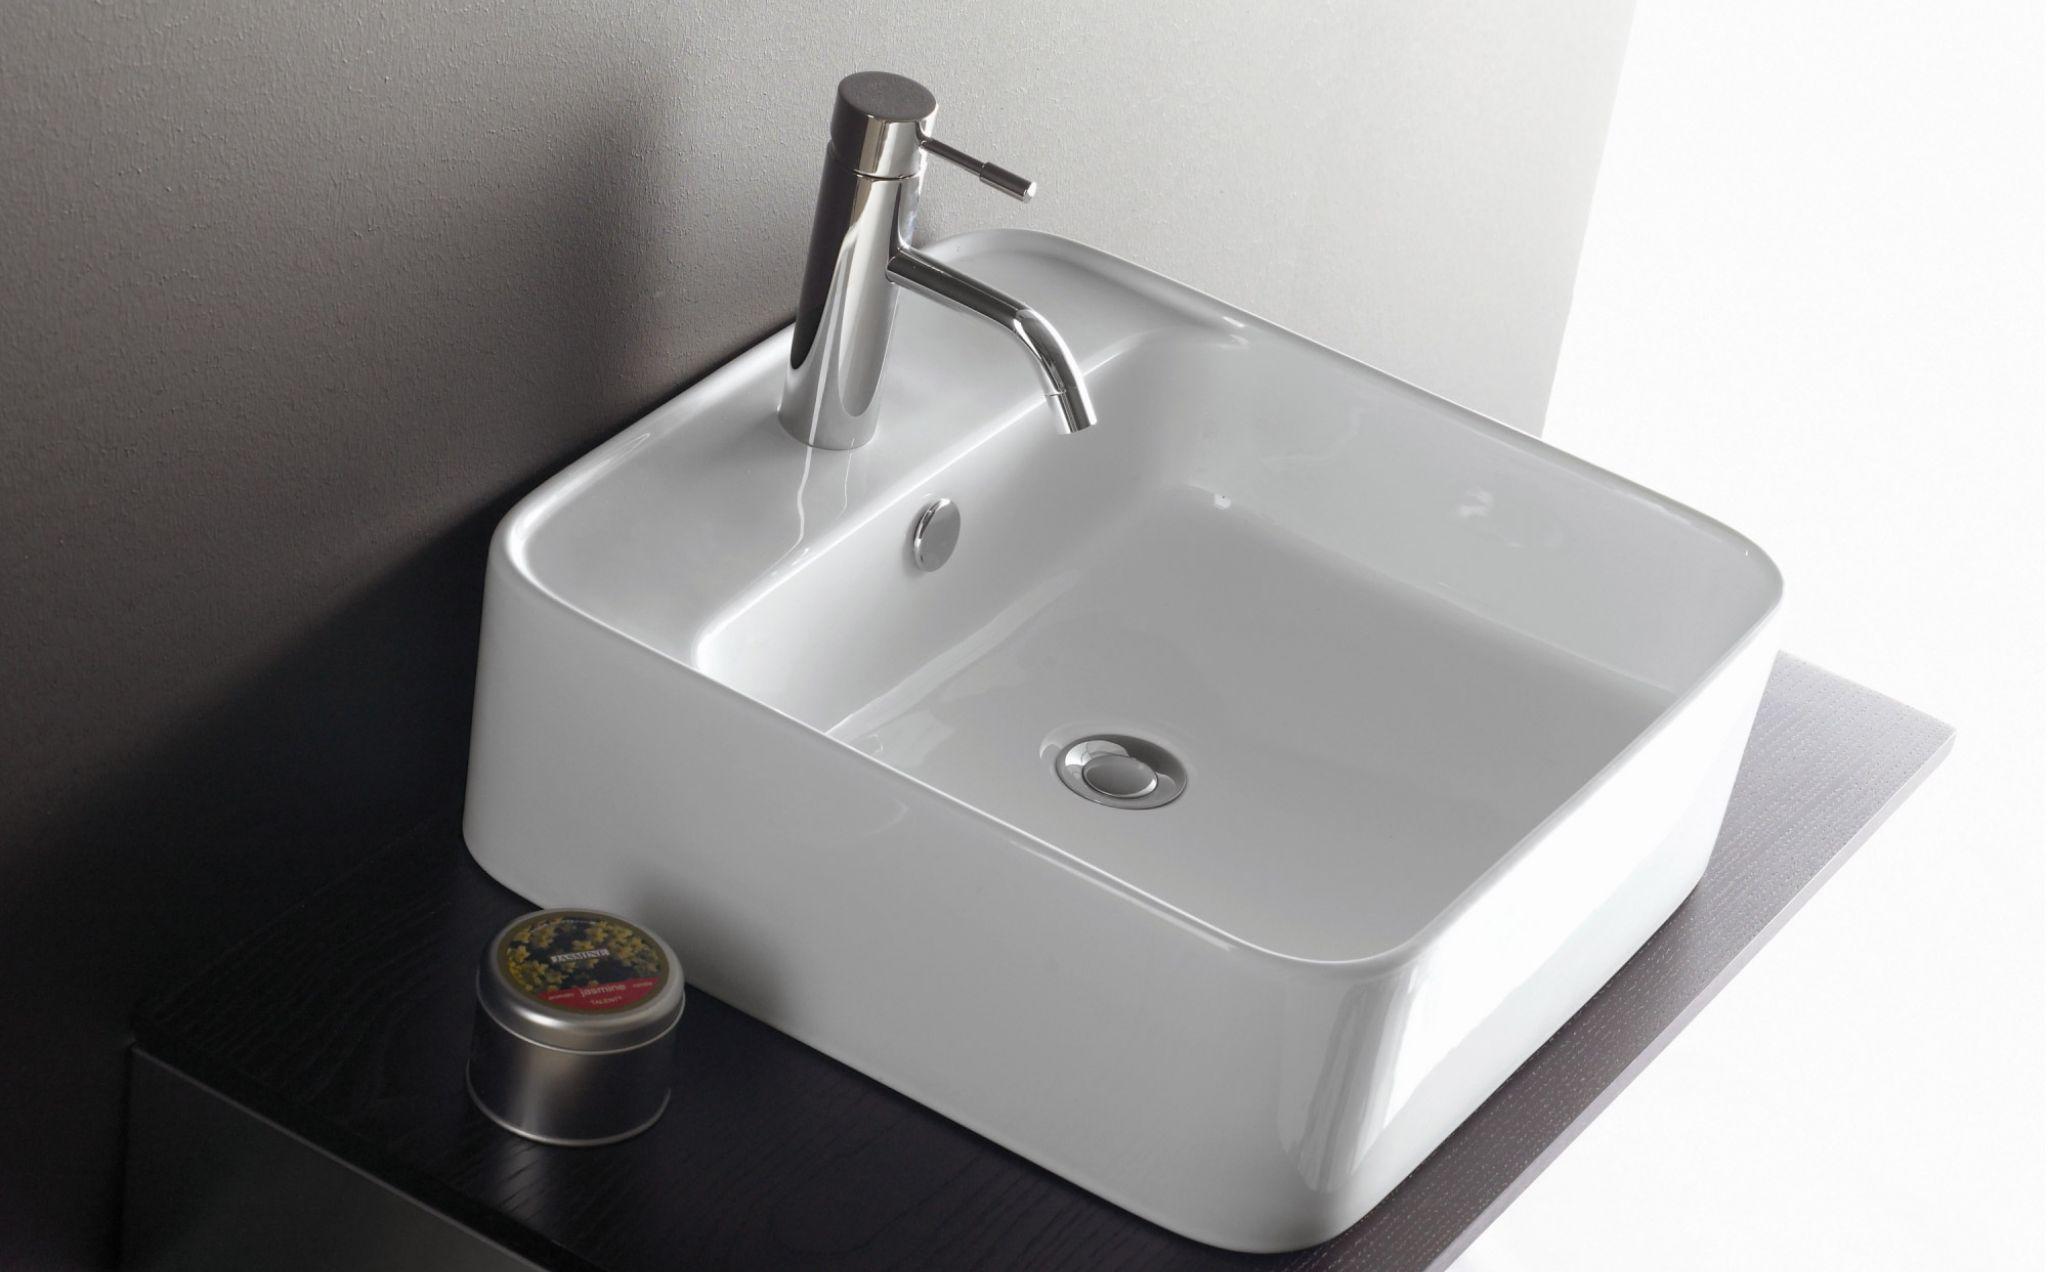 lavabo orotava rectangular de porcelana sobre encimera sin